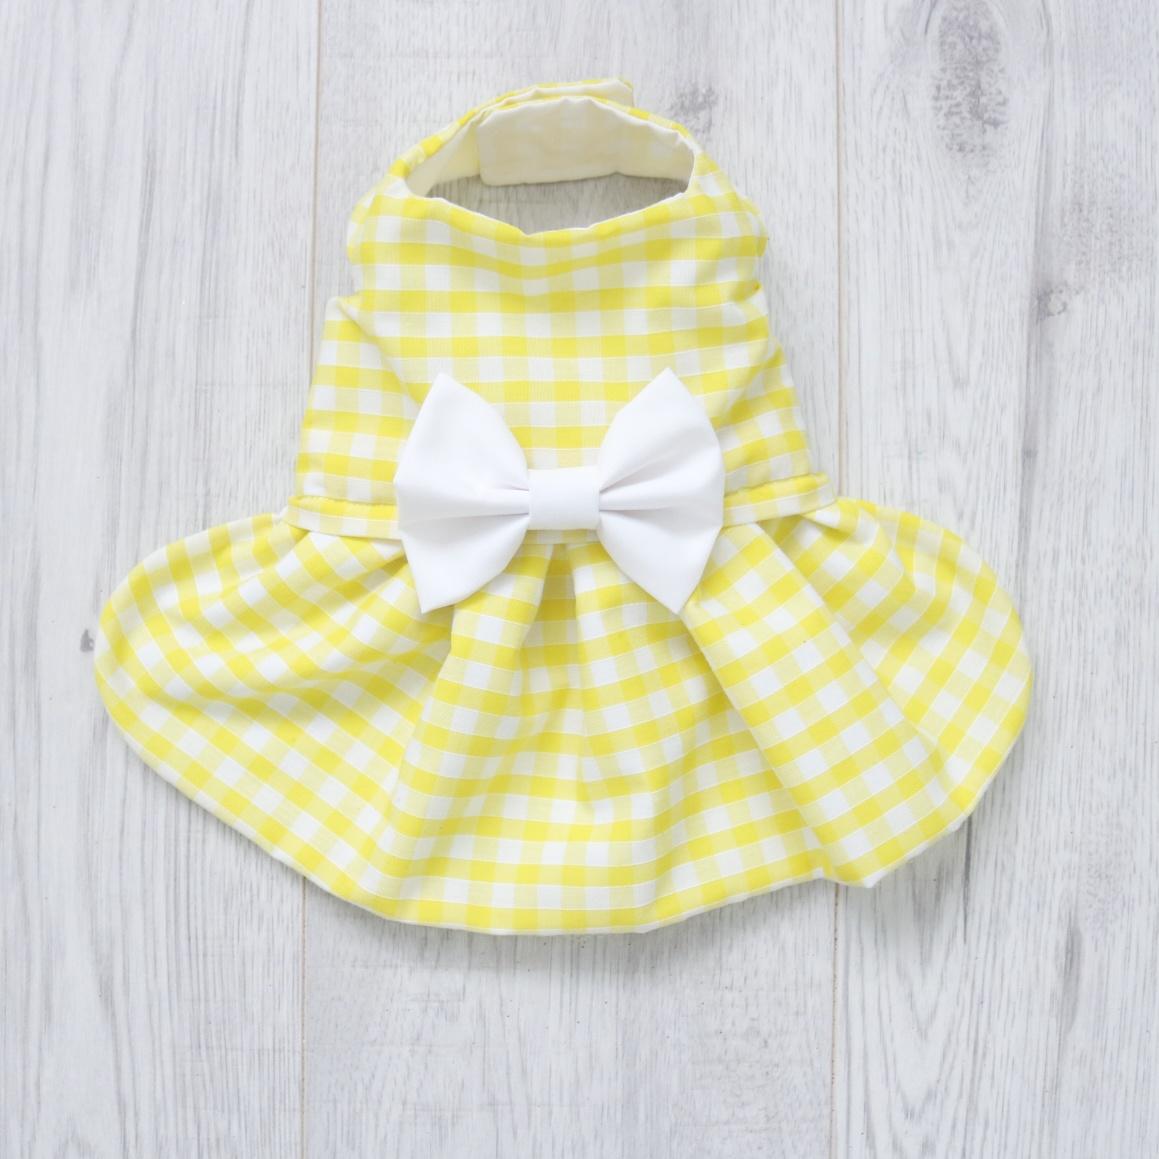 yellow gingham dog dress